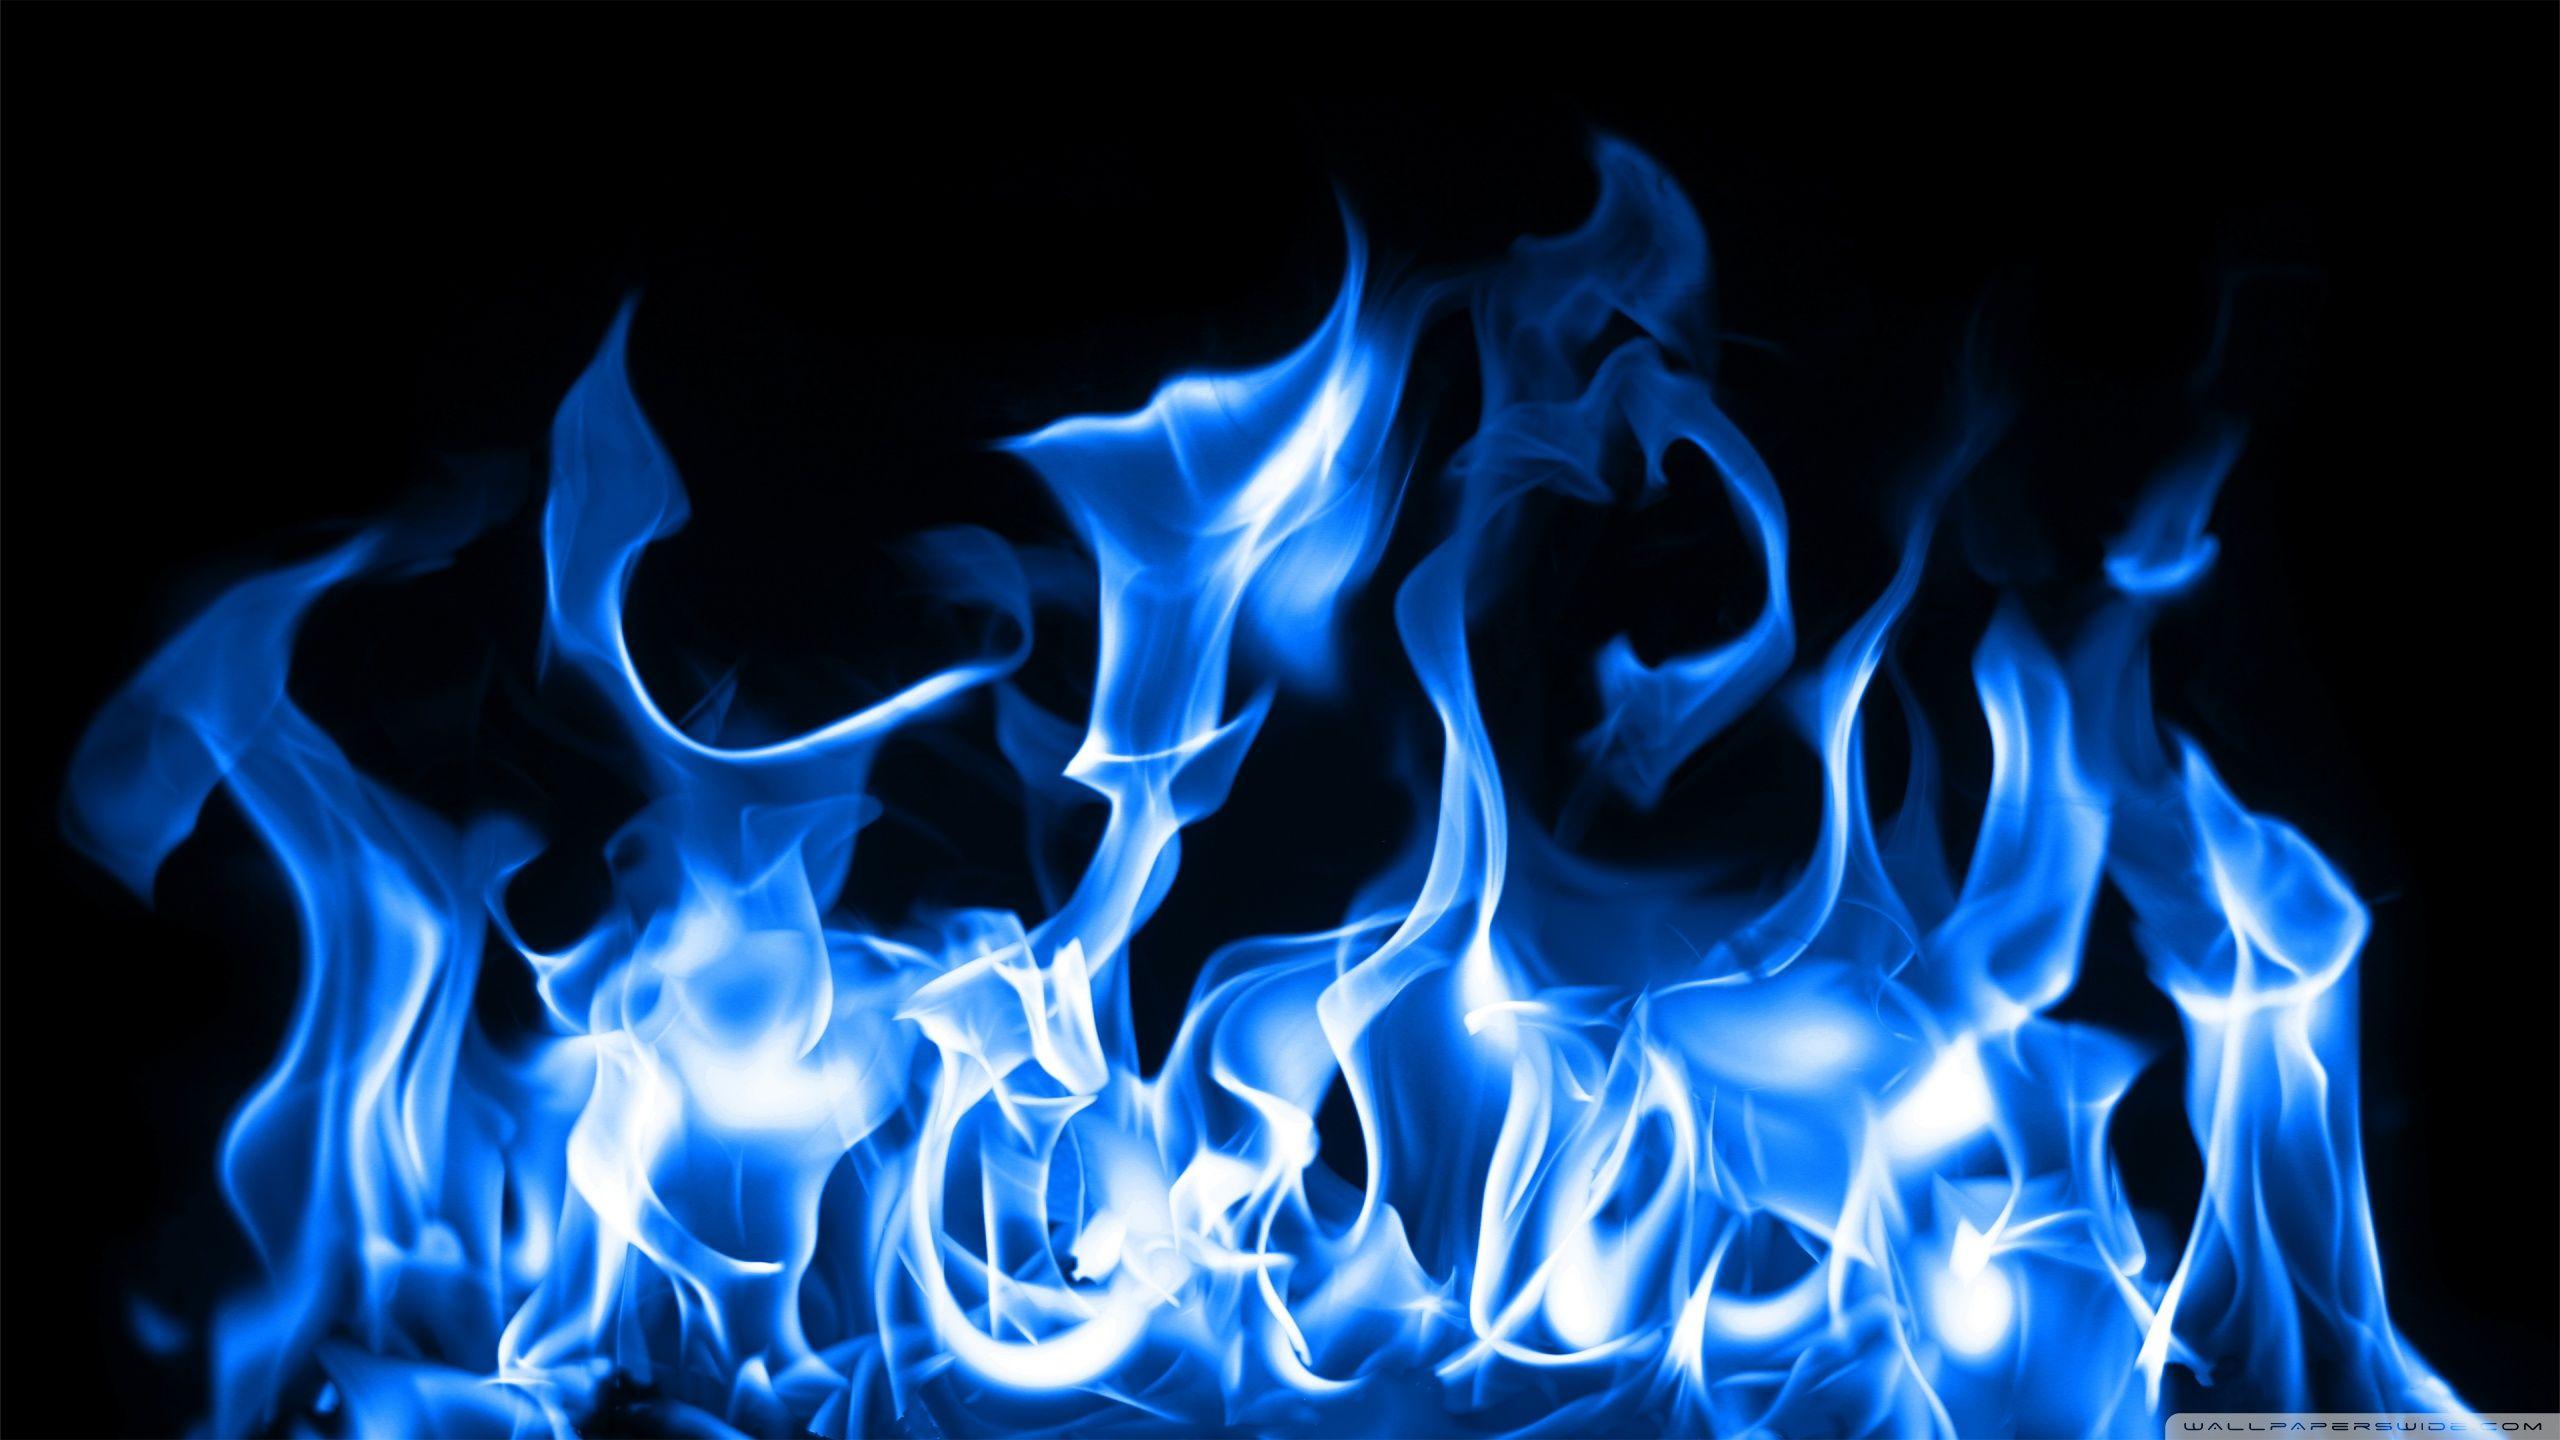 Abstract hd wallpaper blue fire figure in fire pinterest hd abstract hd wallpaper blue fire buycottarizona